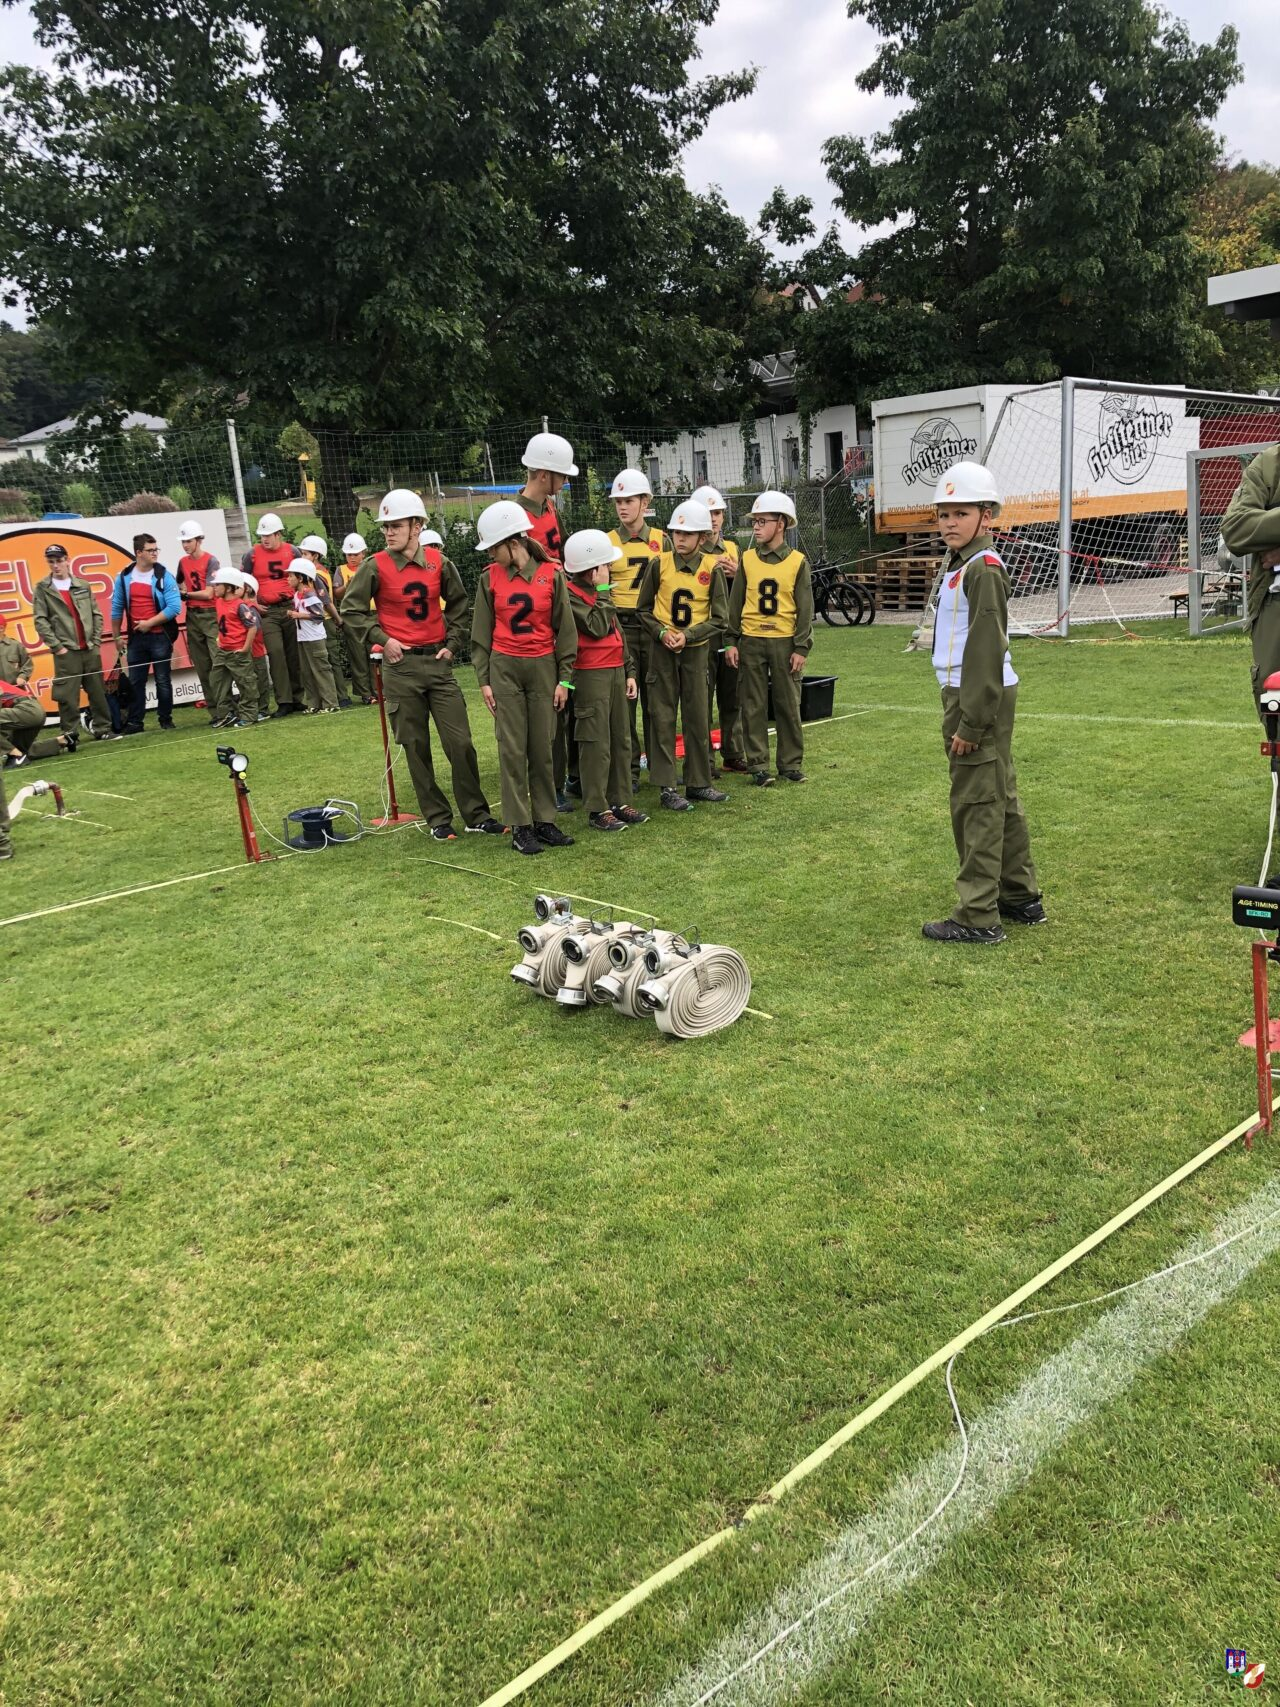 Trainingsbewerb in St.Martin